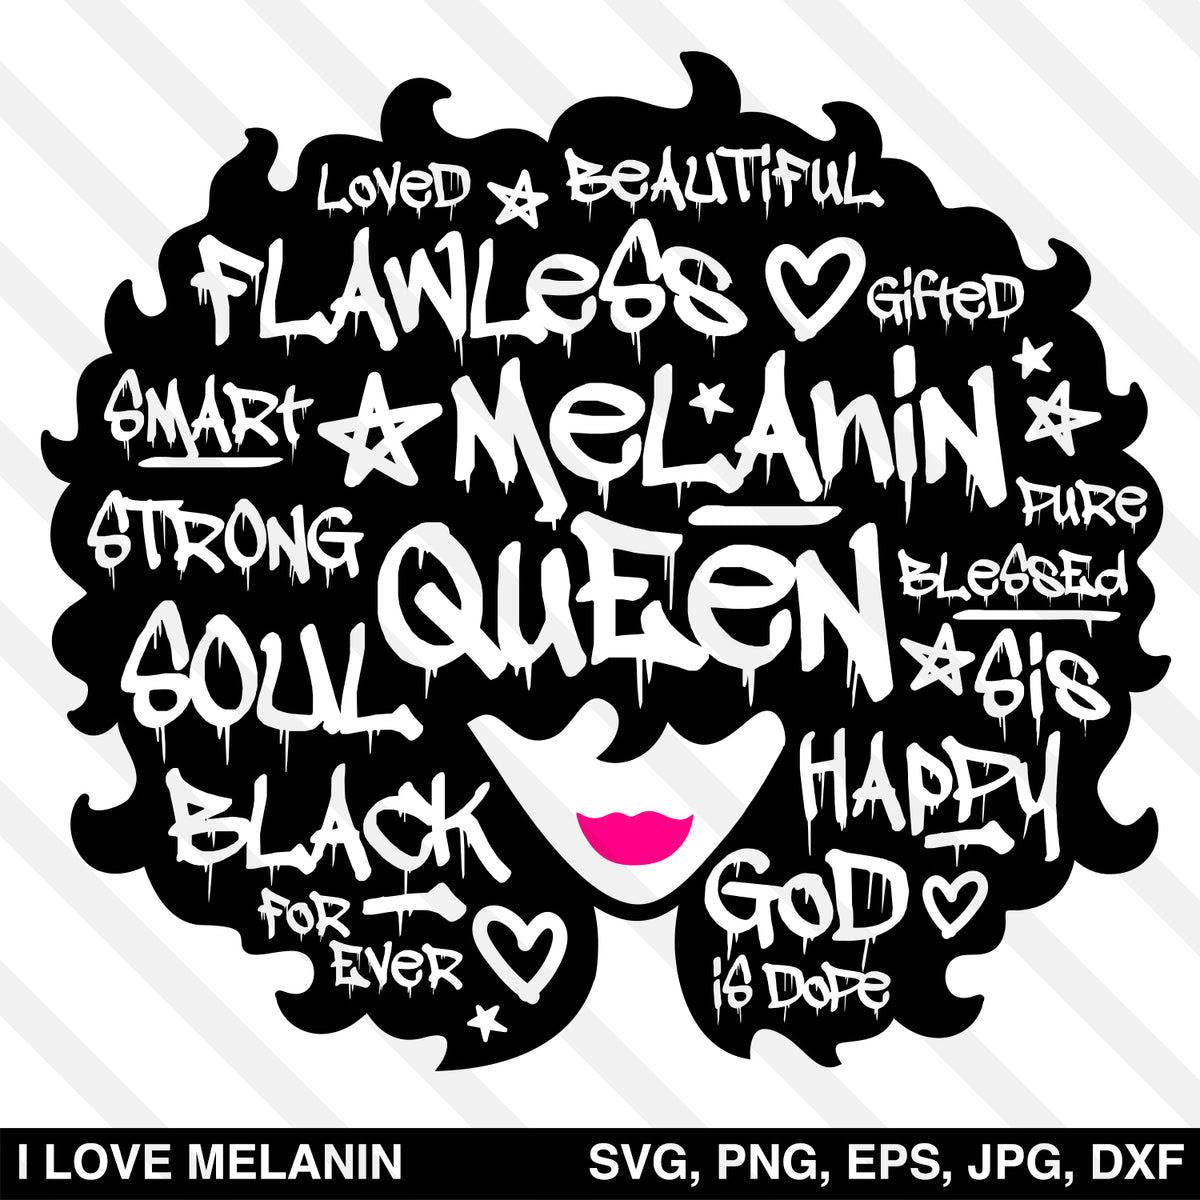 Graffiti Black Queen Afro Woman SVG - I Love Melanin